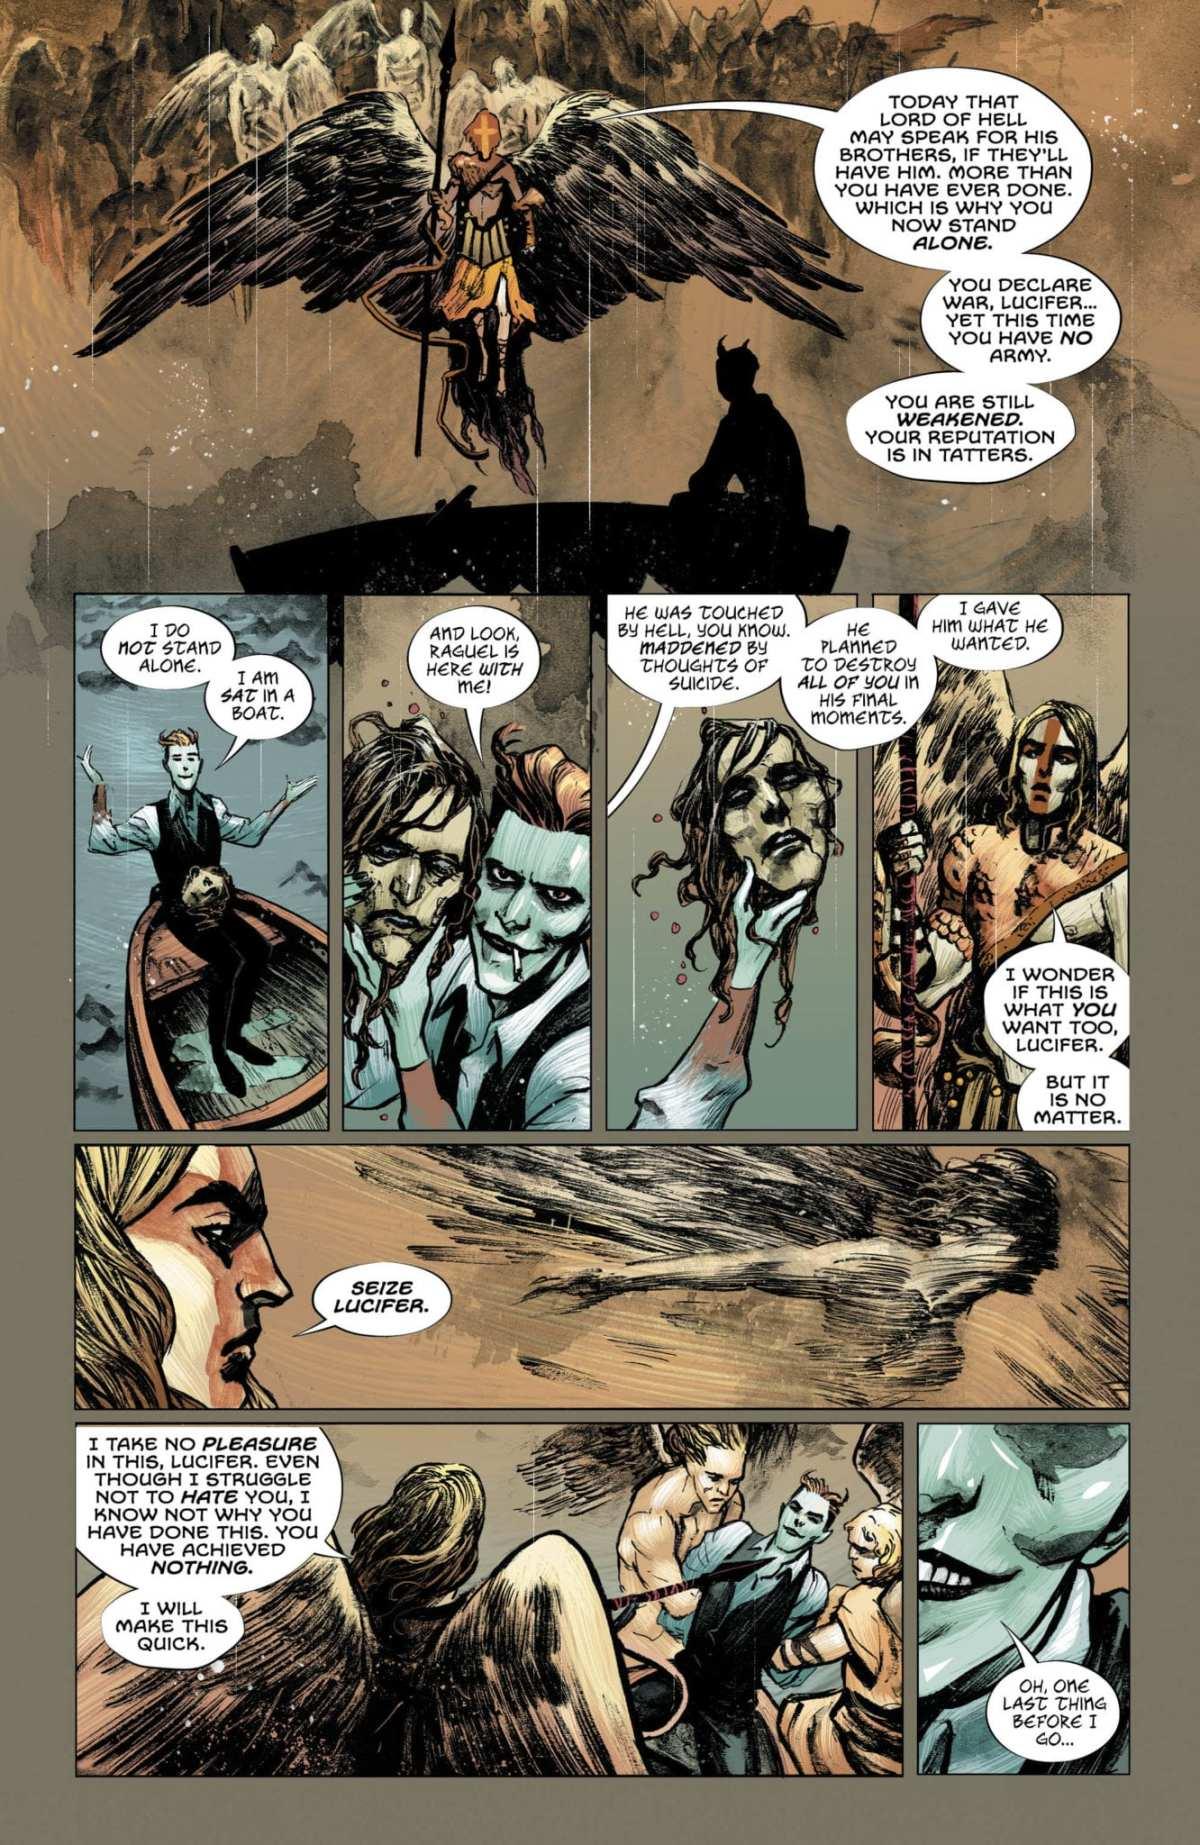 Lucifer #13, Page #6: Lucifer speaks to Ramiel